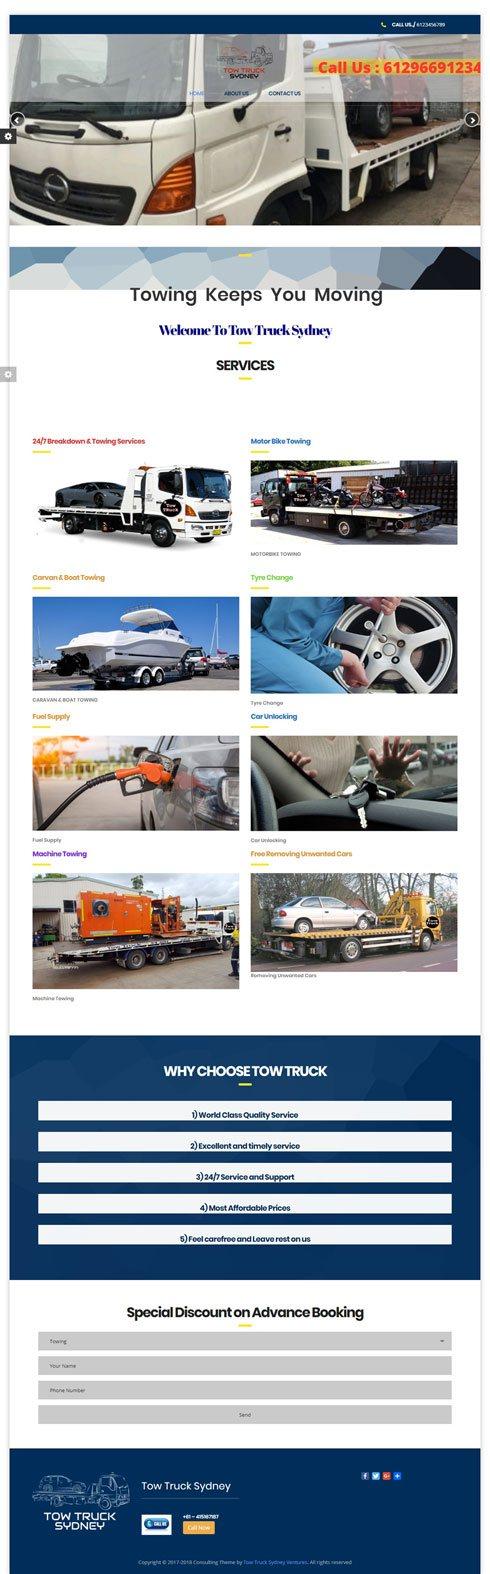 Tow Truck Sydney Australia Web Design